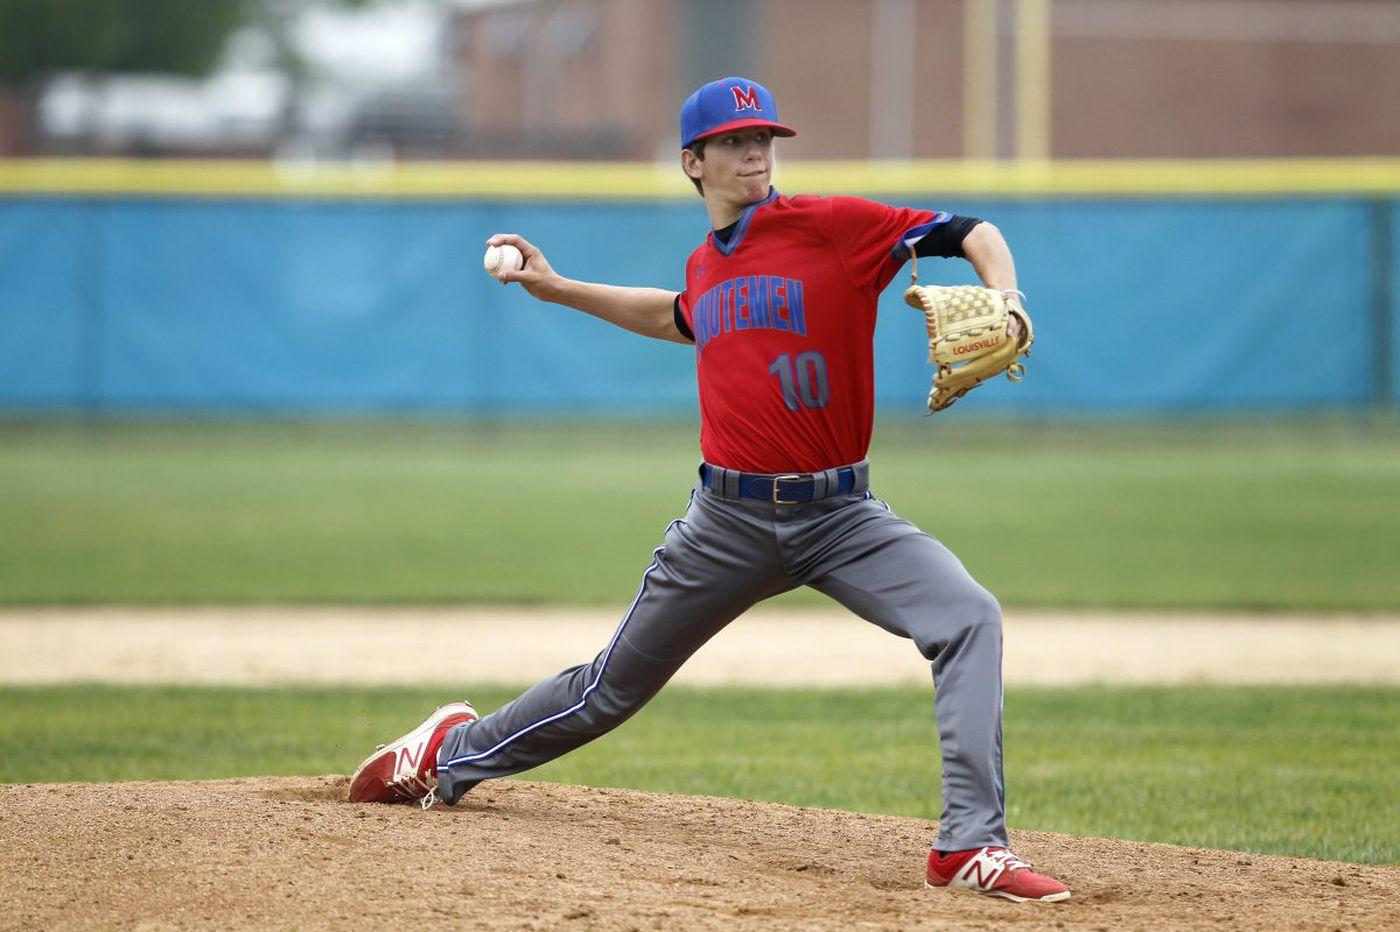 Eric Cartafalsa powers Washington Twp. baseball to Diamond Classic win